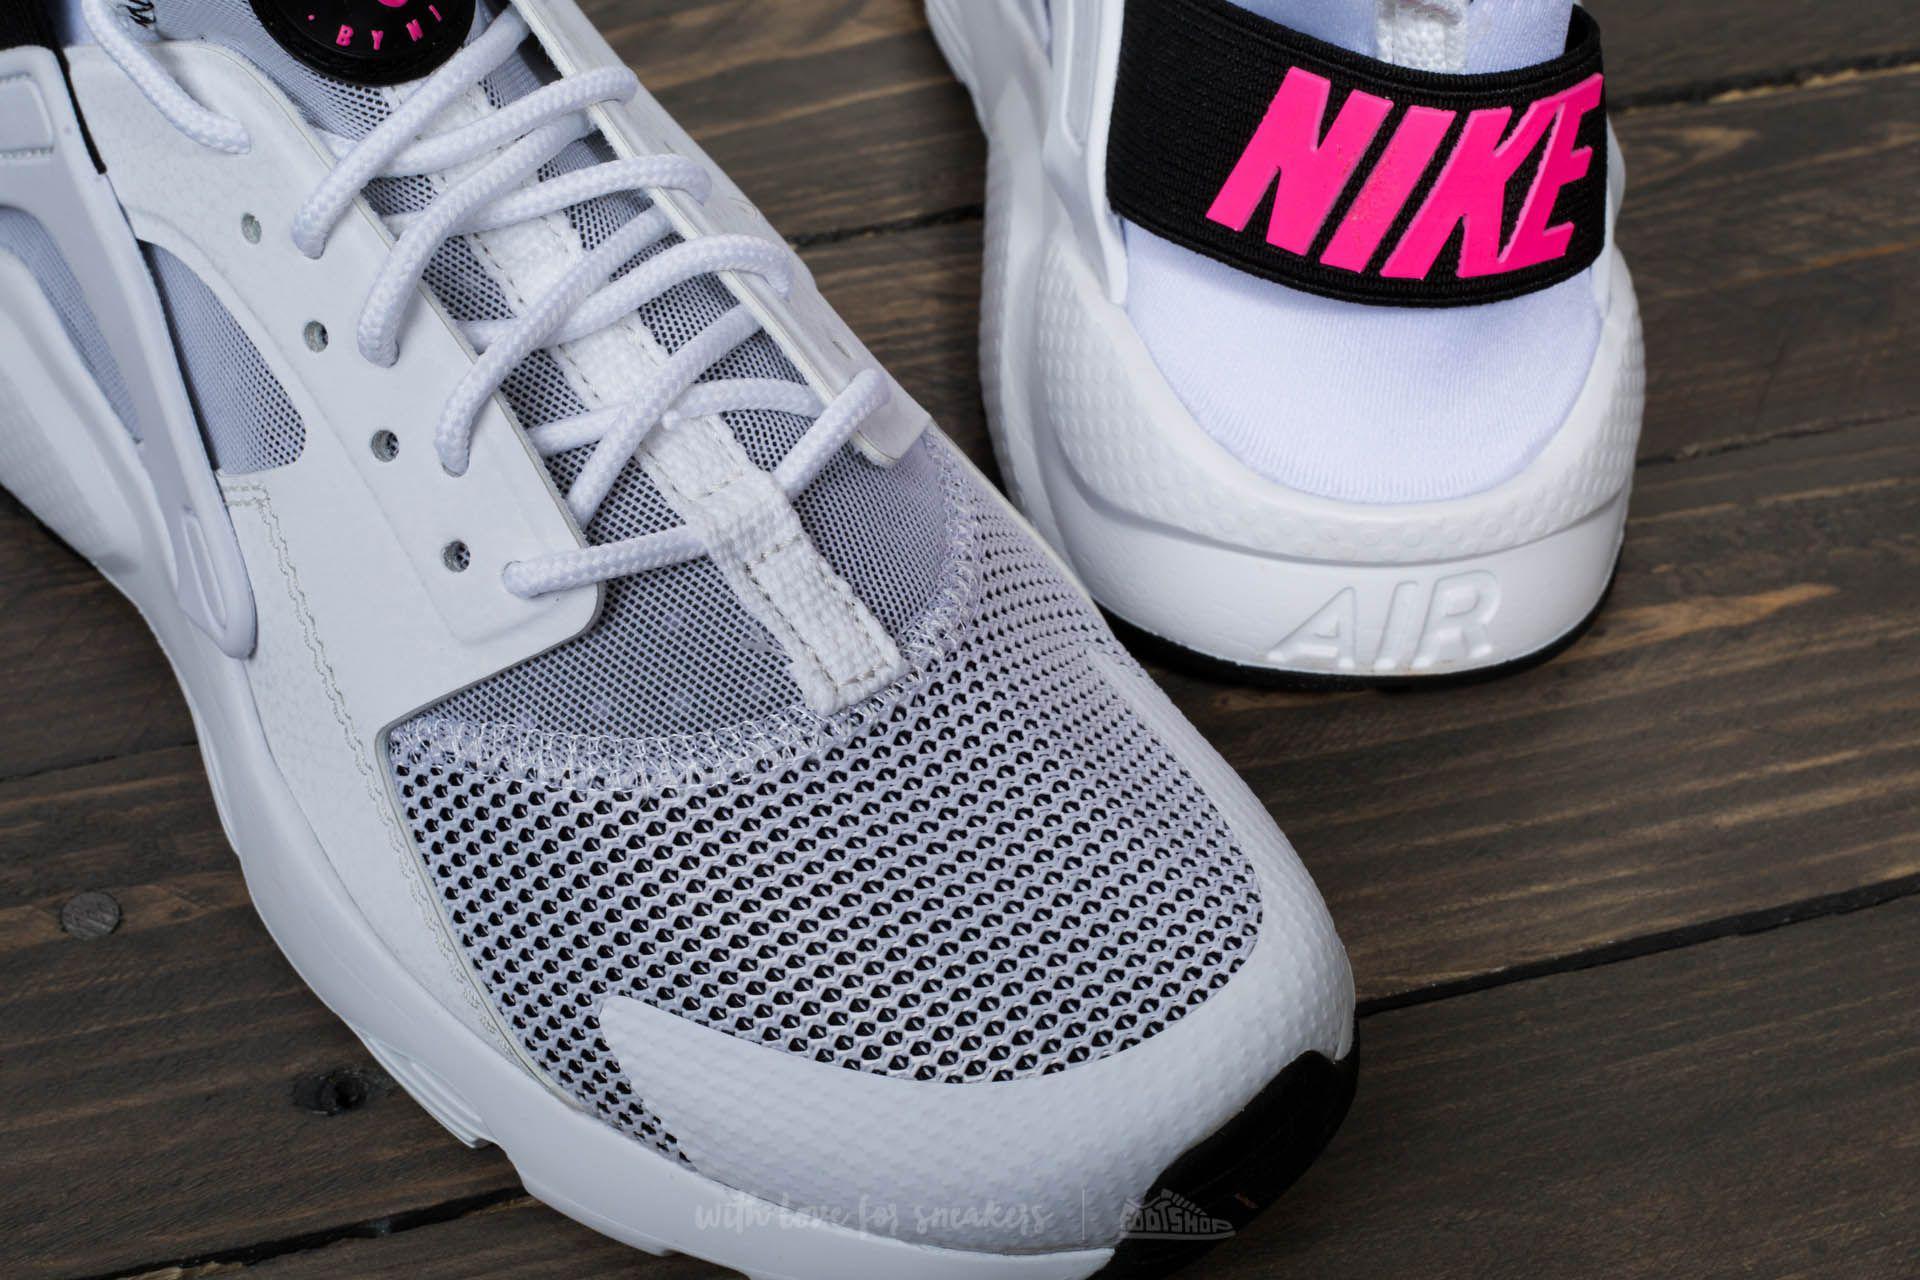 f23a290a1b8b9 switzerland lyst nike air huarache run ultra gs white black pink blast  787ae 4d07f